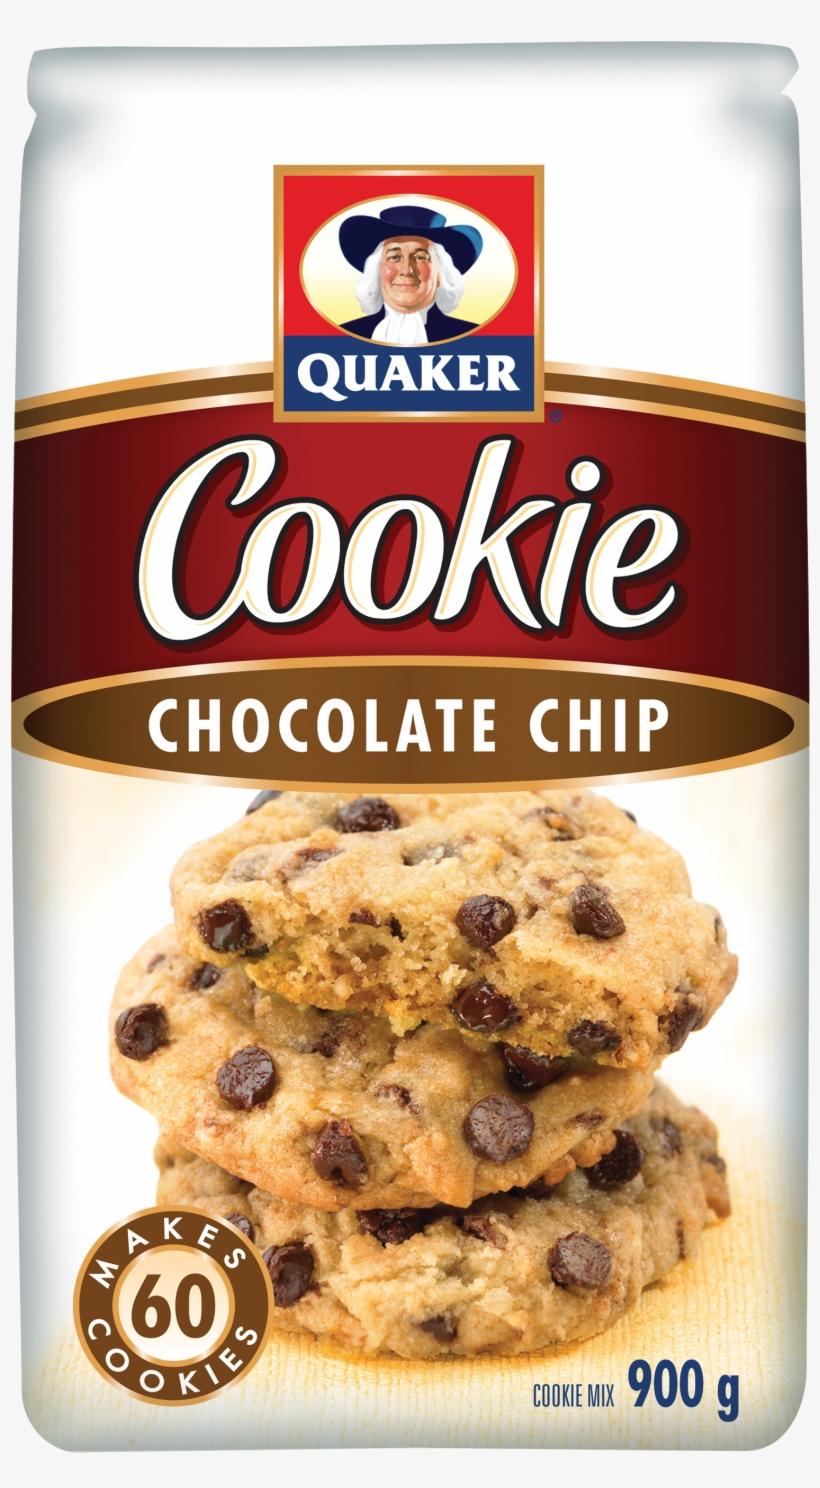 Quaker® Chocolate Chip Cookie Mix - Quaker Cookie Chocolate Chip, transparent png #794052